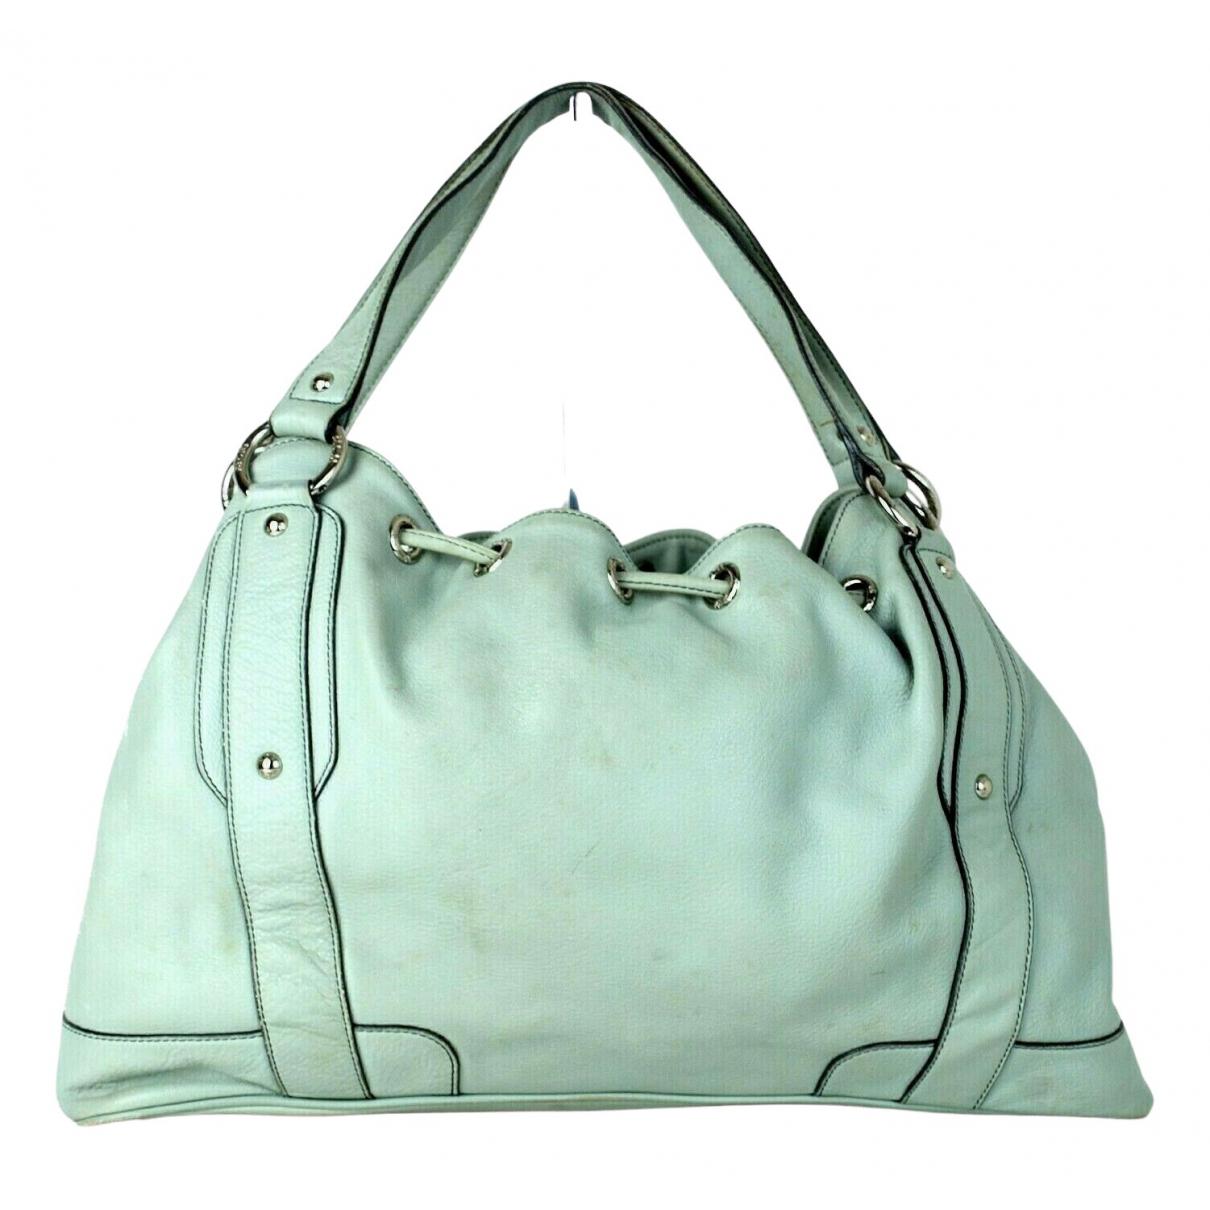 Mcm \N Handtasche in  Gruen Leder